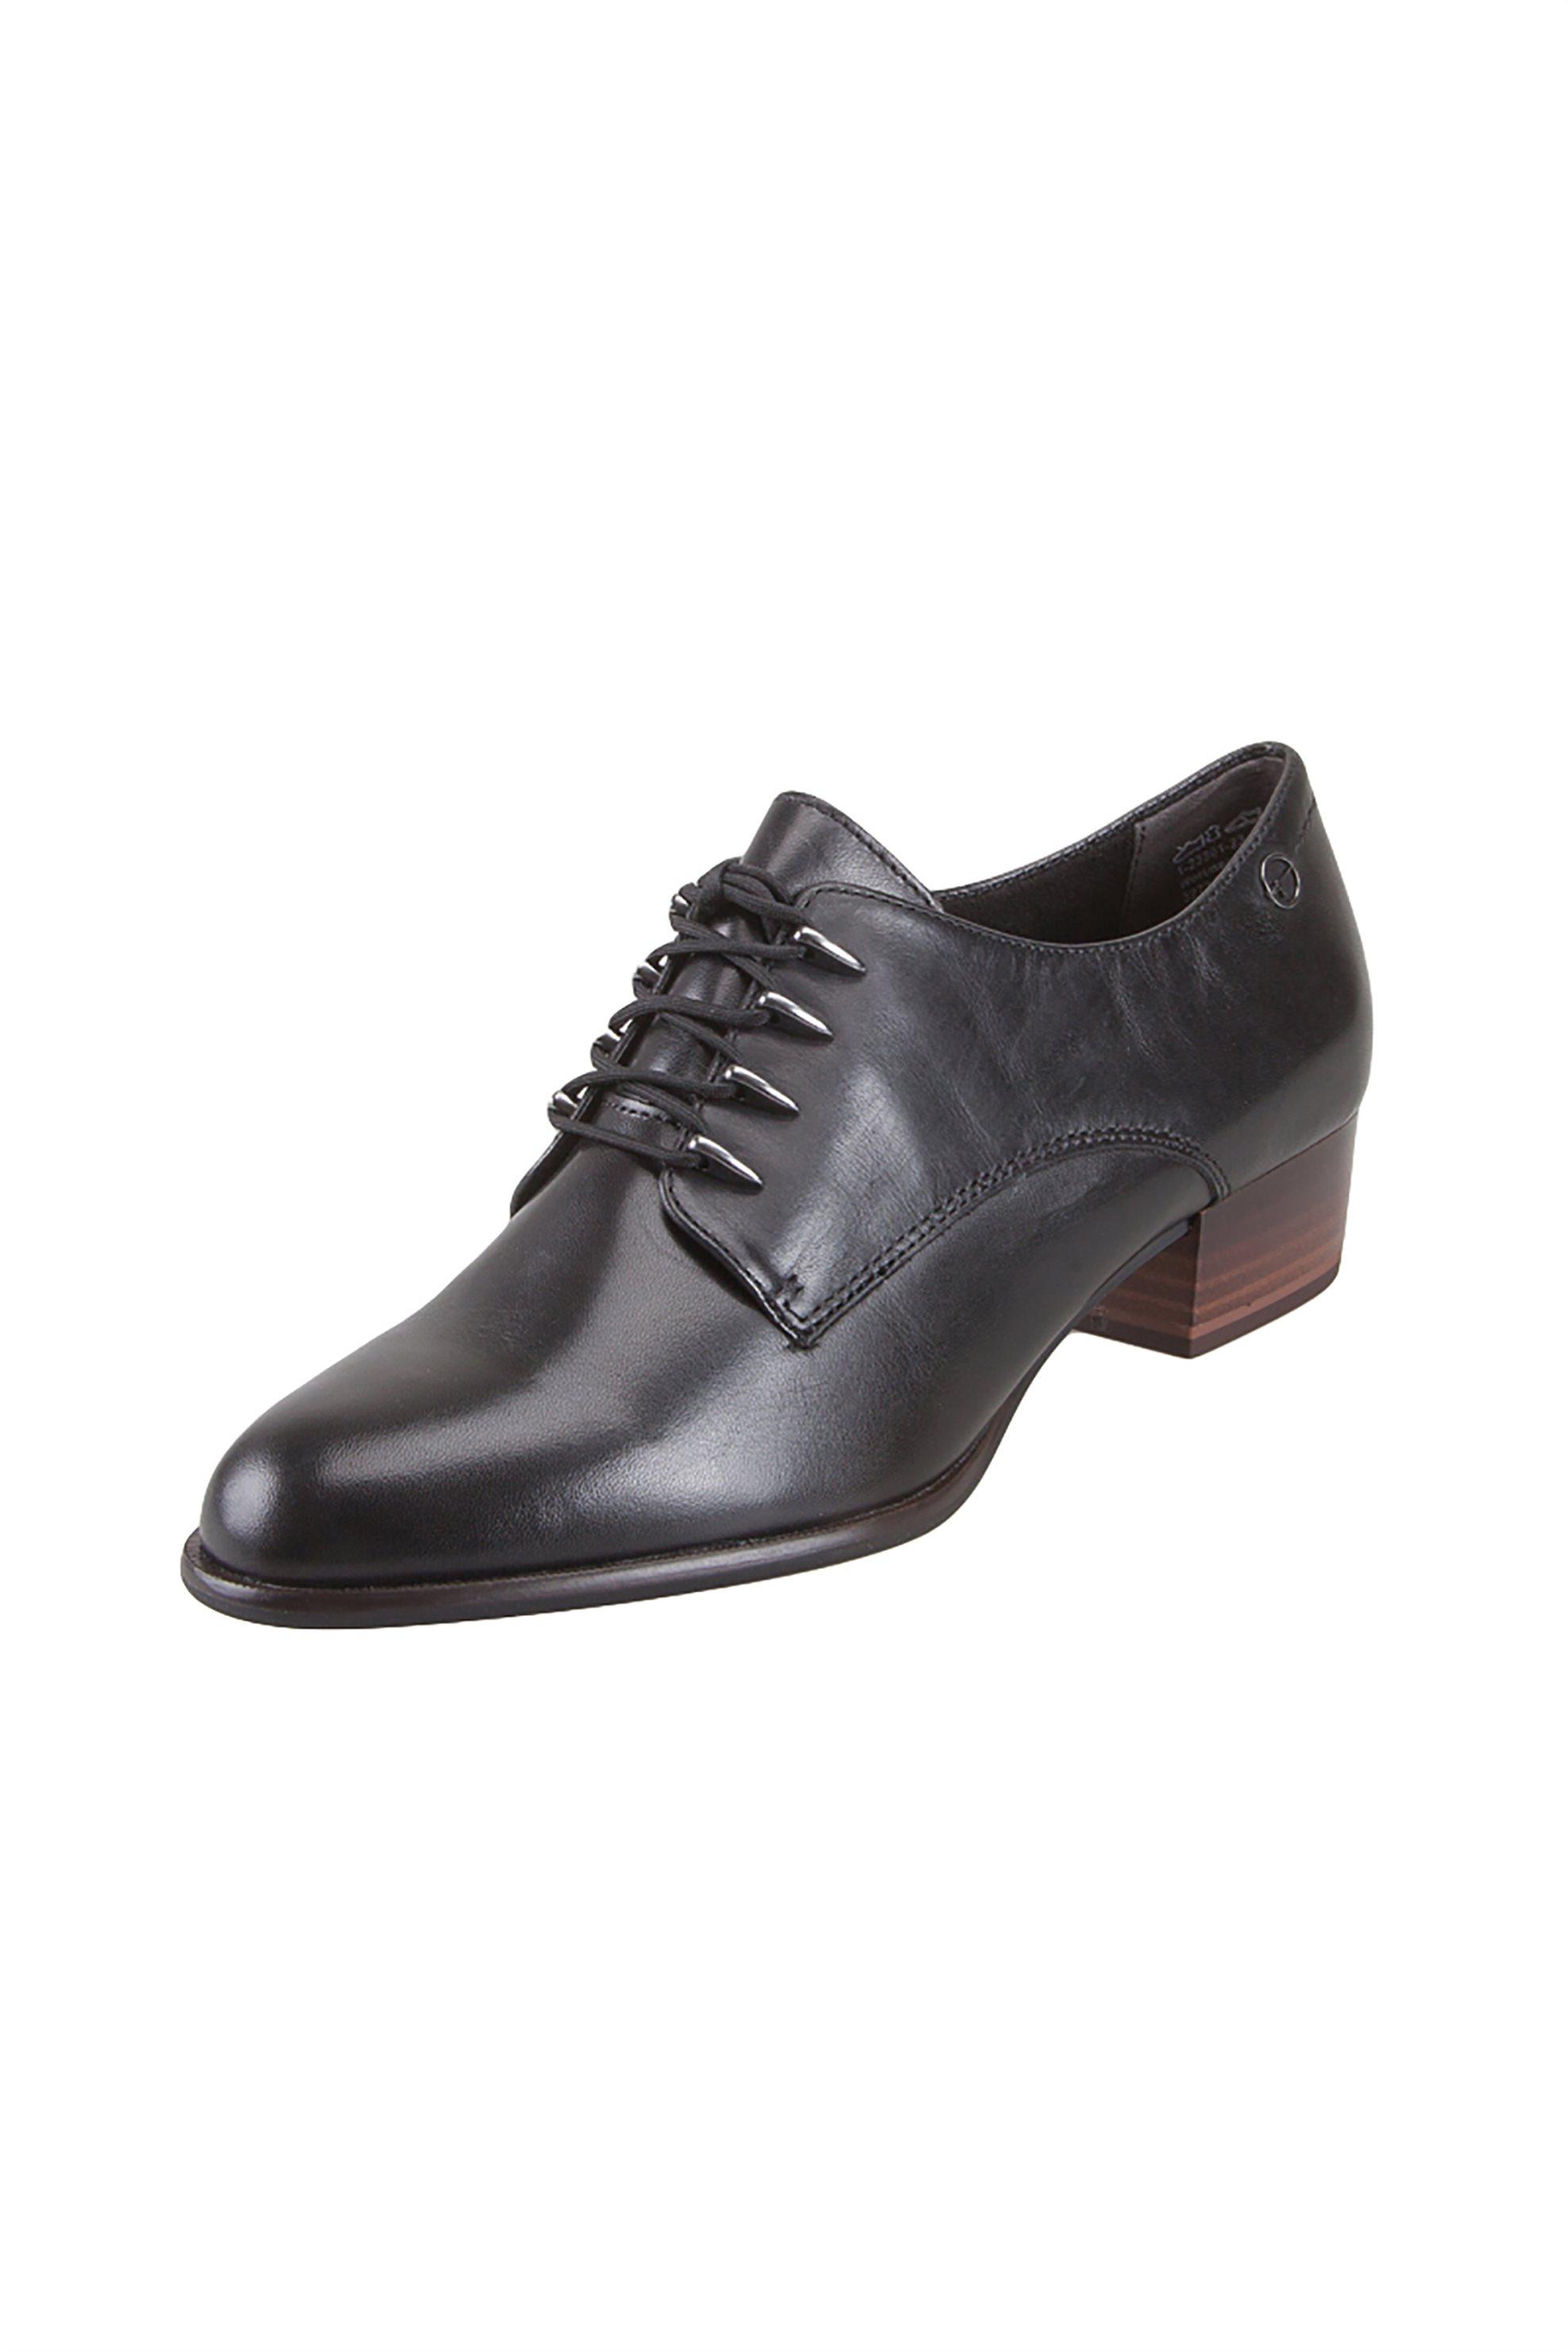 "Tamaris γυναικεία παπούτσια oxford ""Lacer"" – 1-1-23301-23 – Μαύρο"